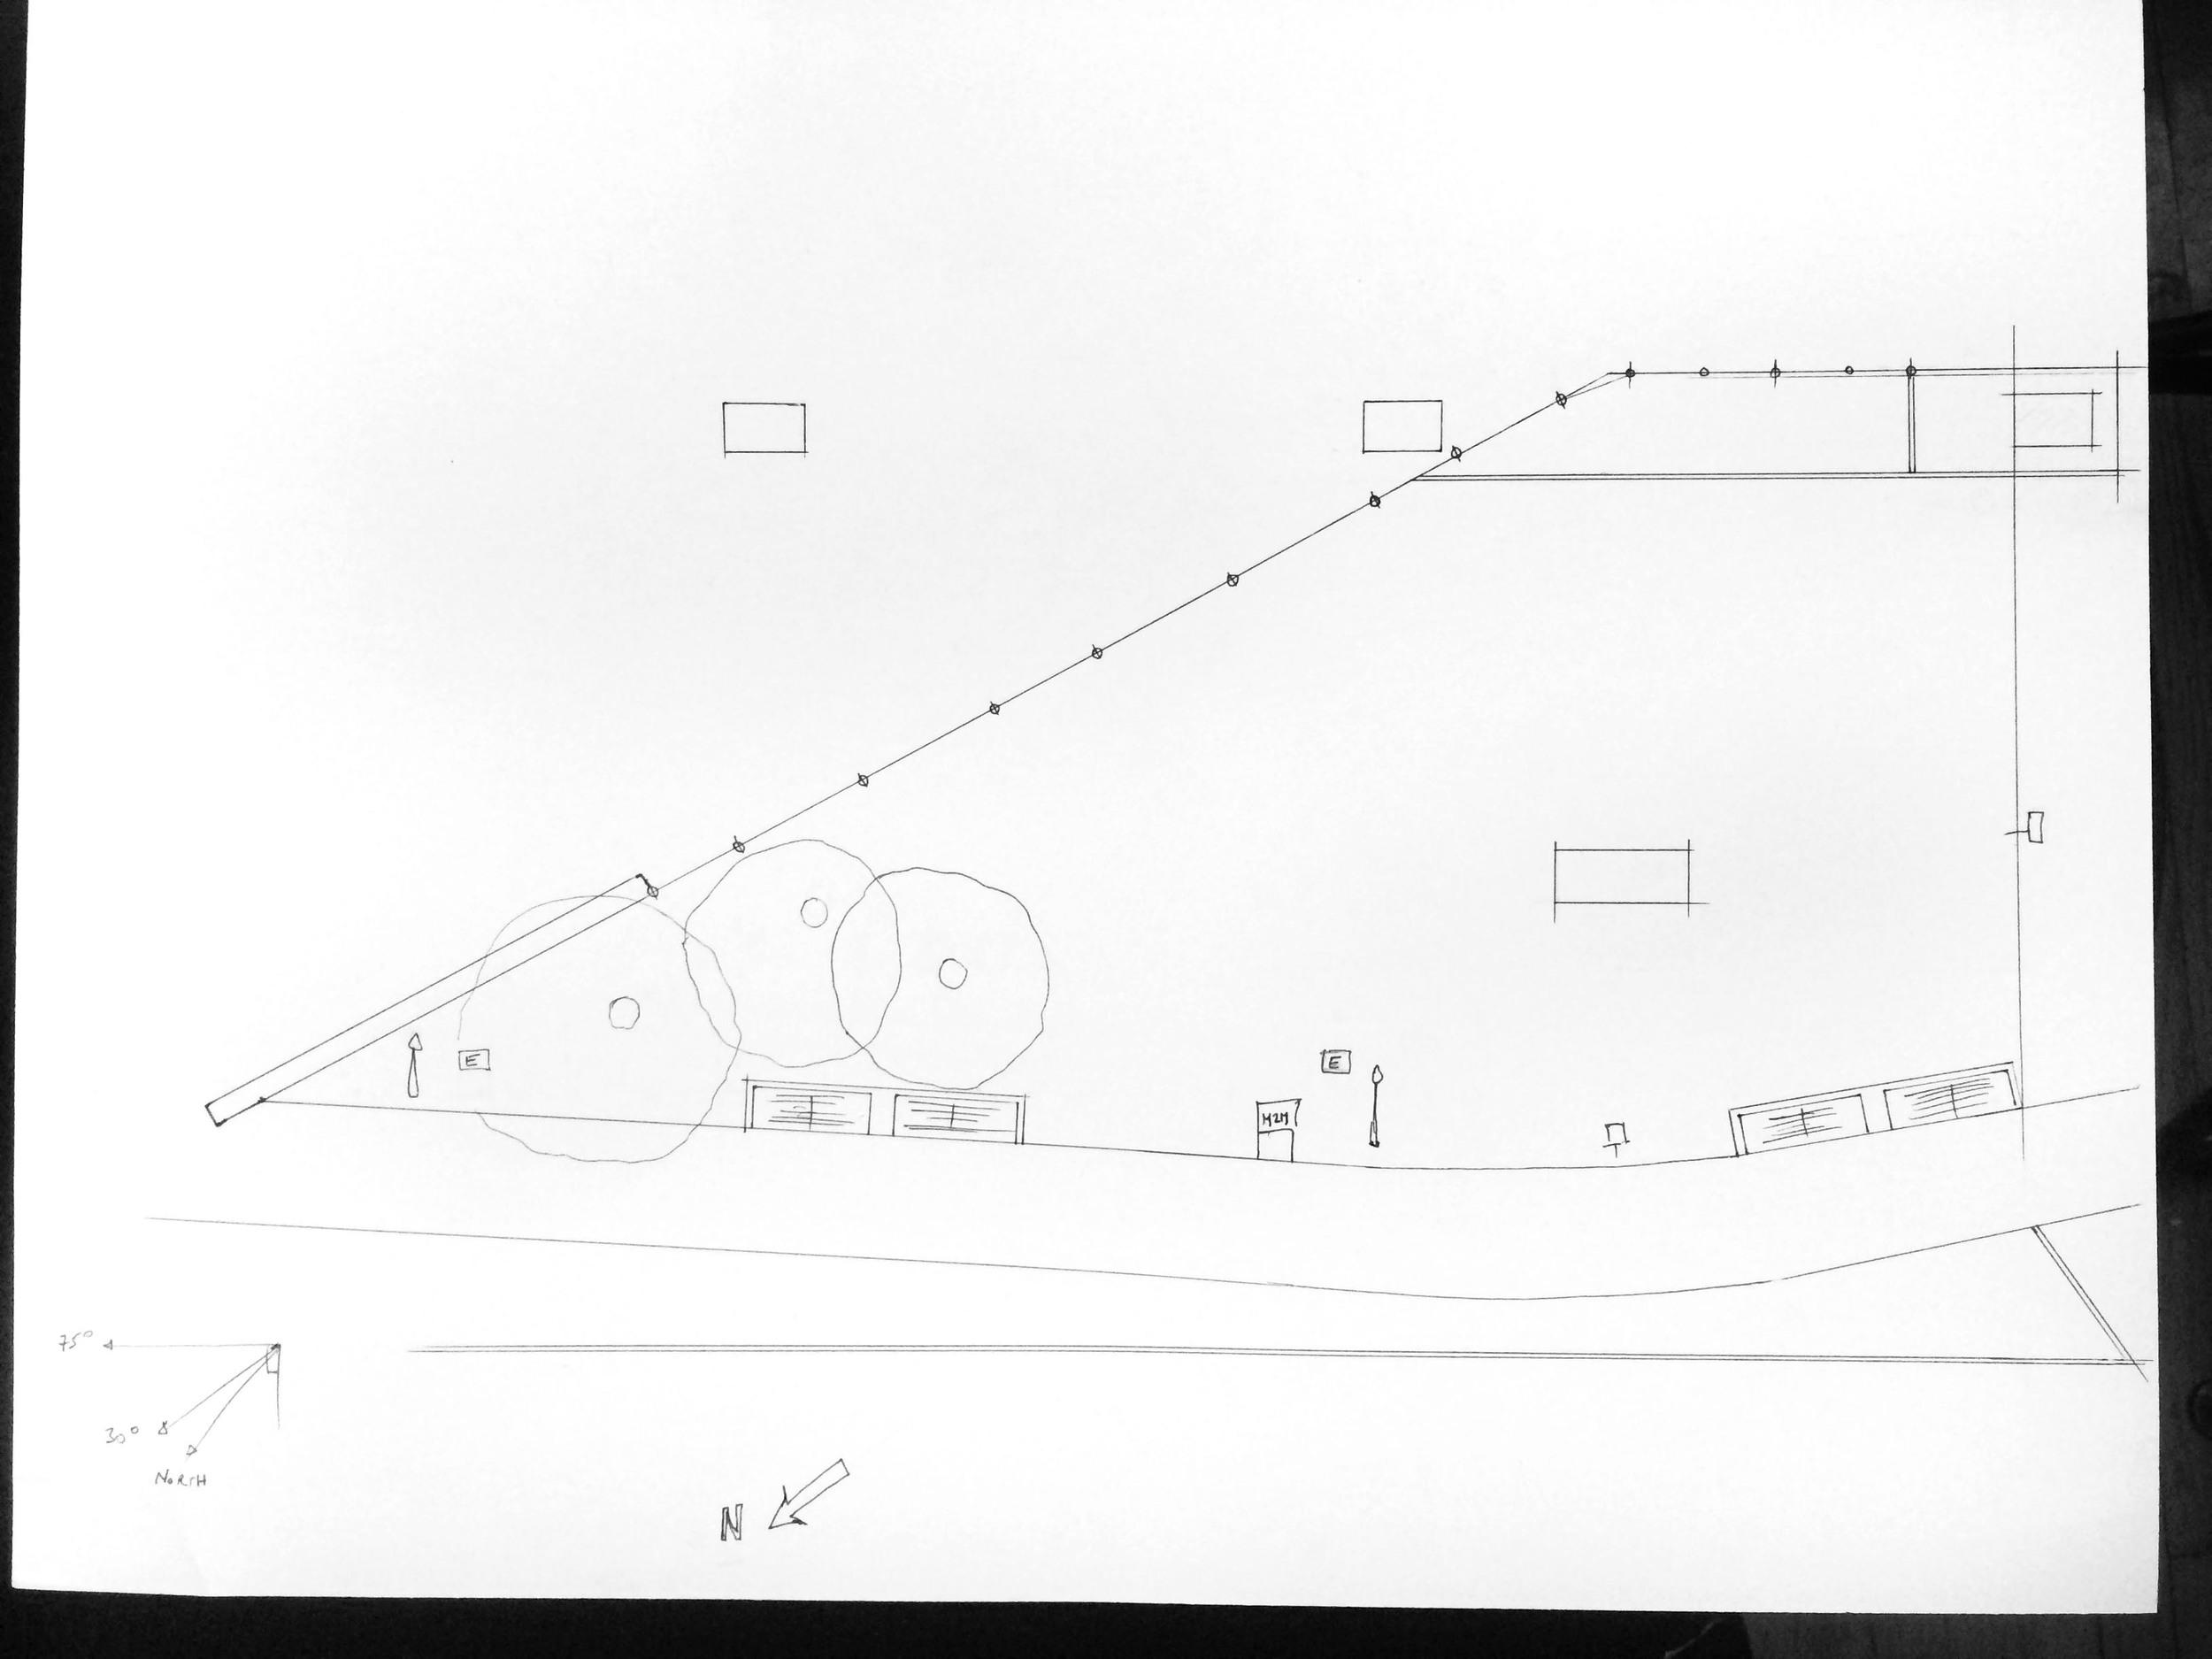 m2m-art-public-art-caroline-bergonzi-map